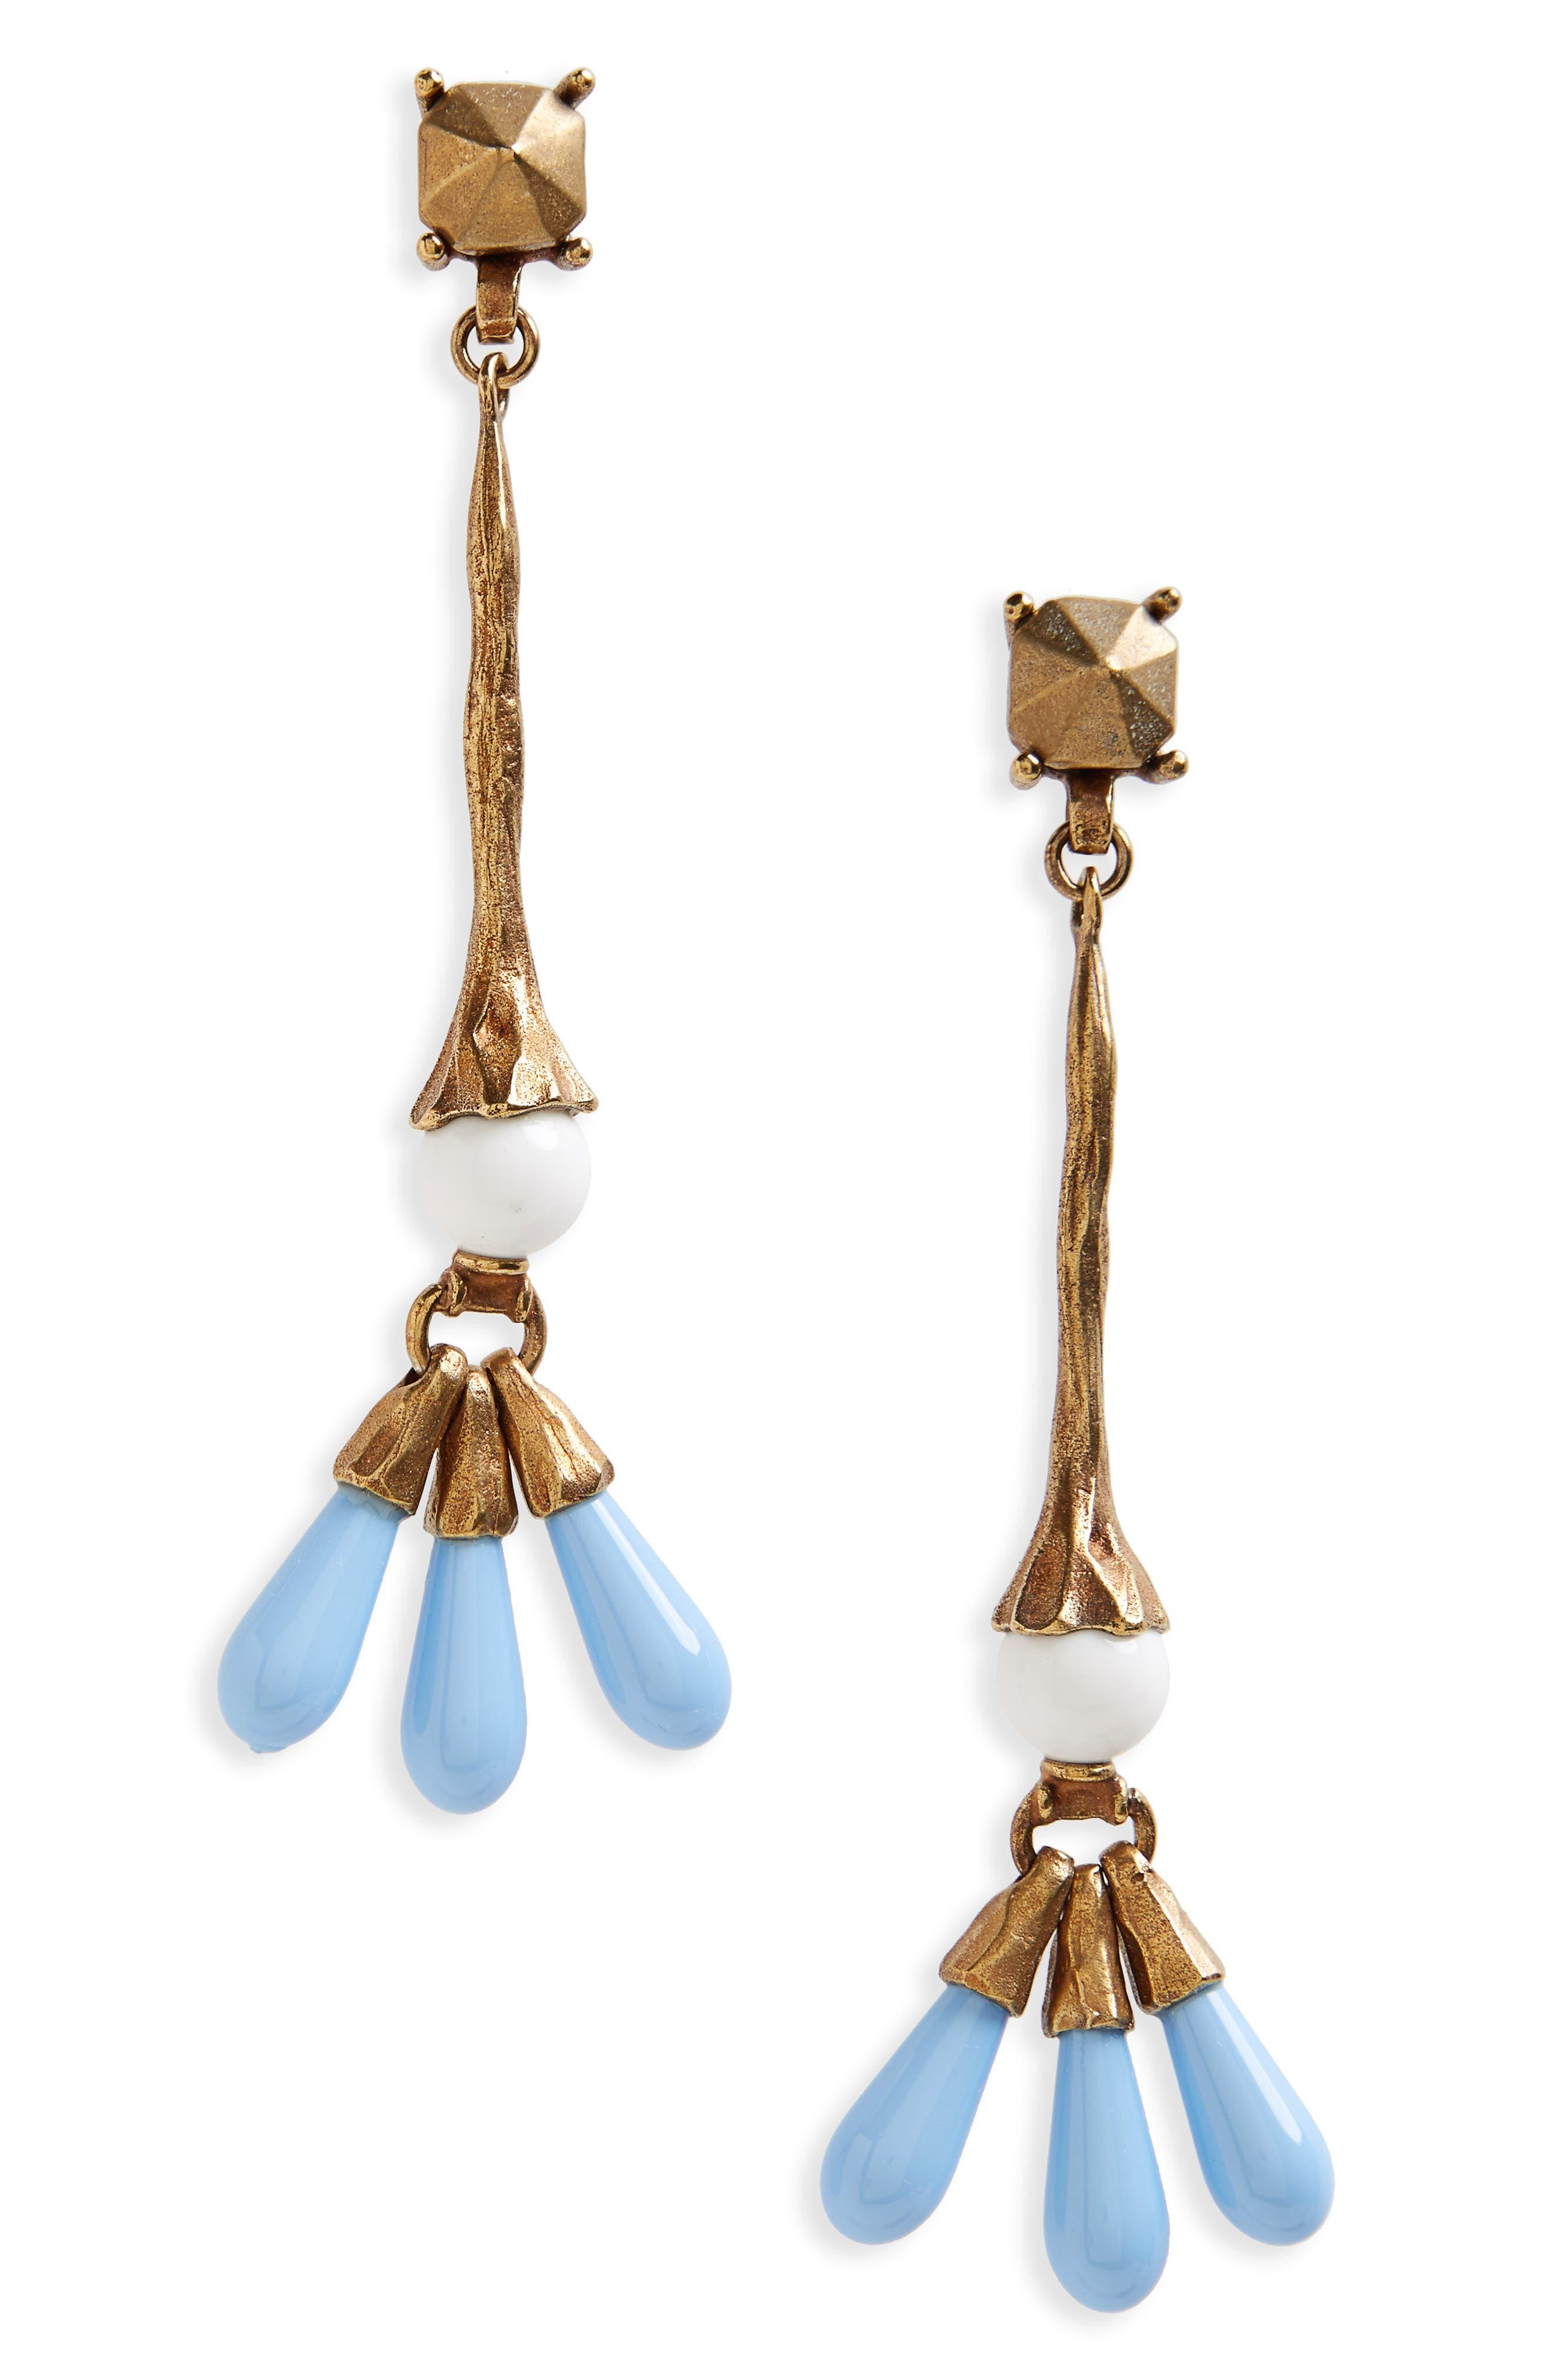 Drop Earrings,                             Main thumbnail 1, color,                             A.GOLD/ BIANCO/ TURCHESE